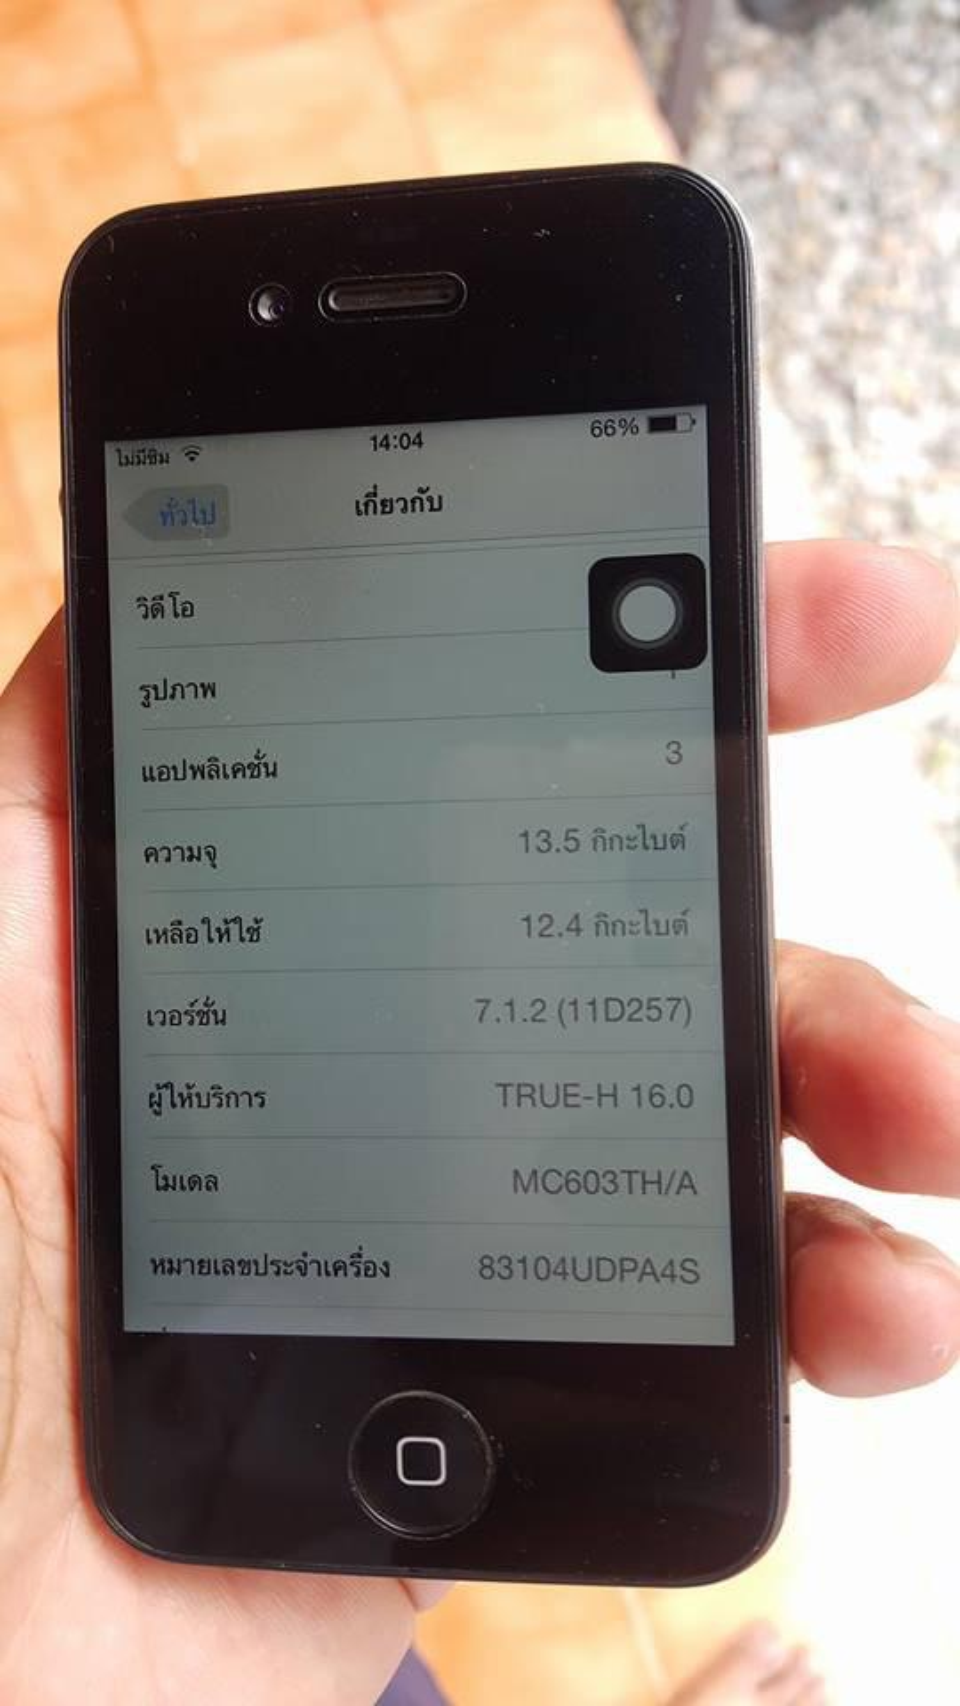 iphone4 16gb เครื่องโมเดลไทย การใช้งานปกติไม่ติดไอดีหรือรหัสอะไร รูปที่ 2